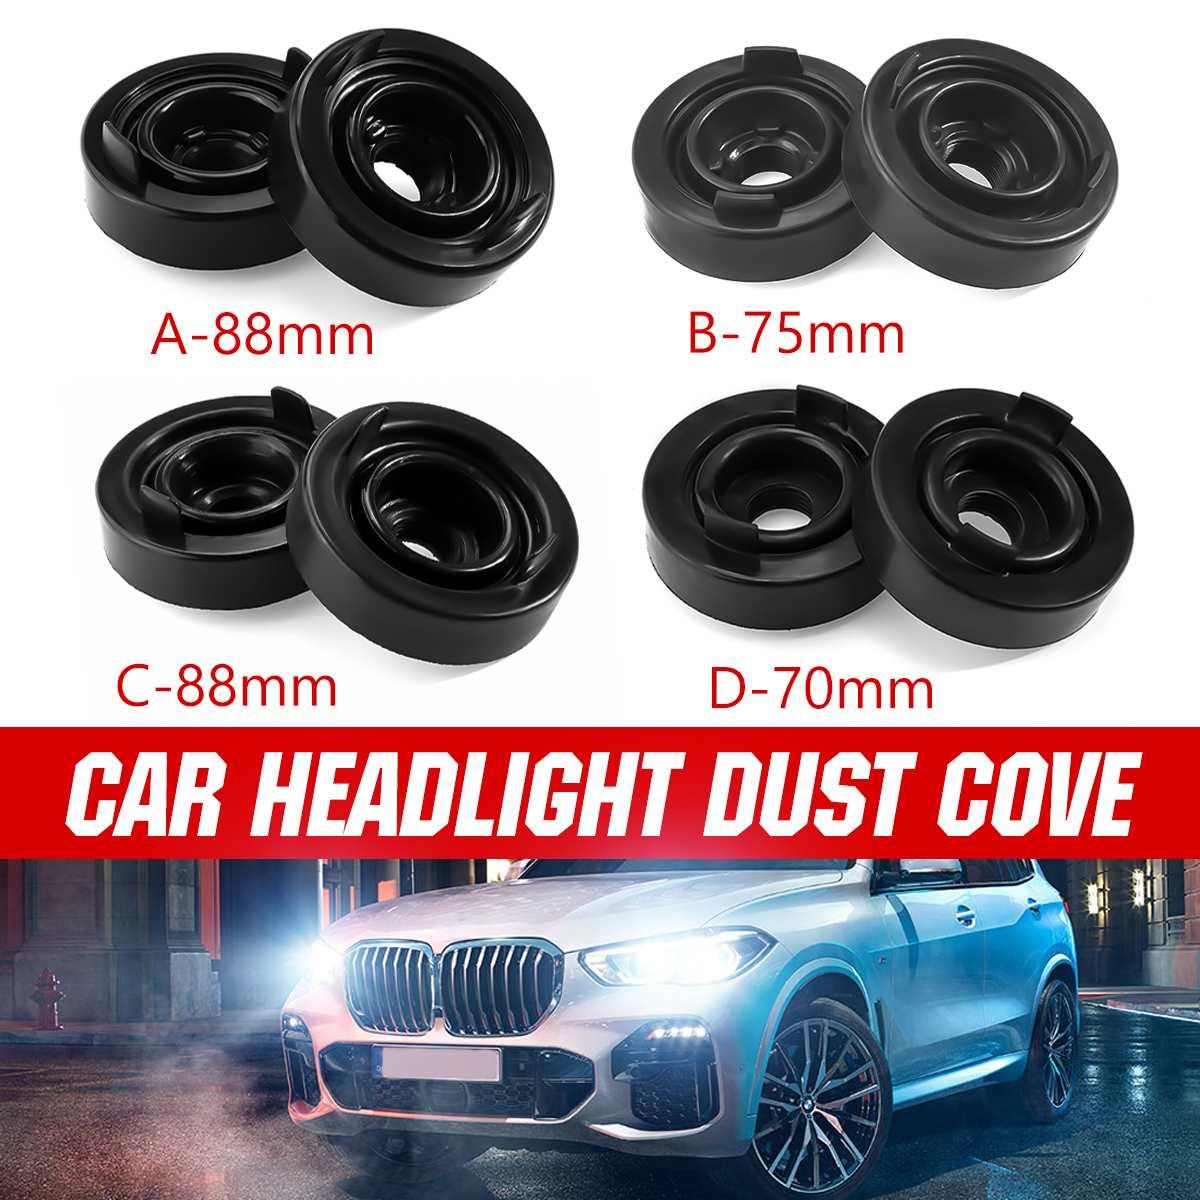 2X Car Headlight Rubber Dust Cover Cap HID LED Headlight Light Lamp Bulb Waterproof Dustproof Sealing Headlamp 70mm 75mm 80mm